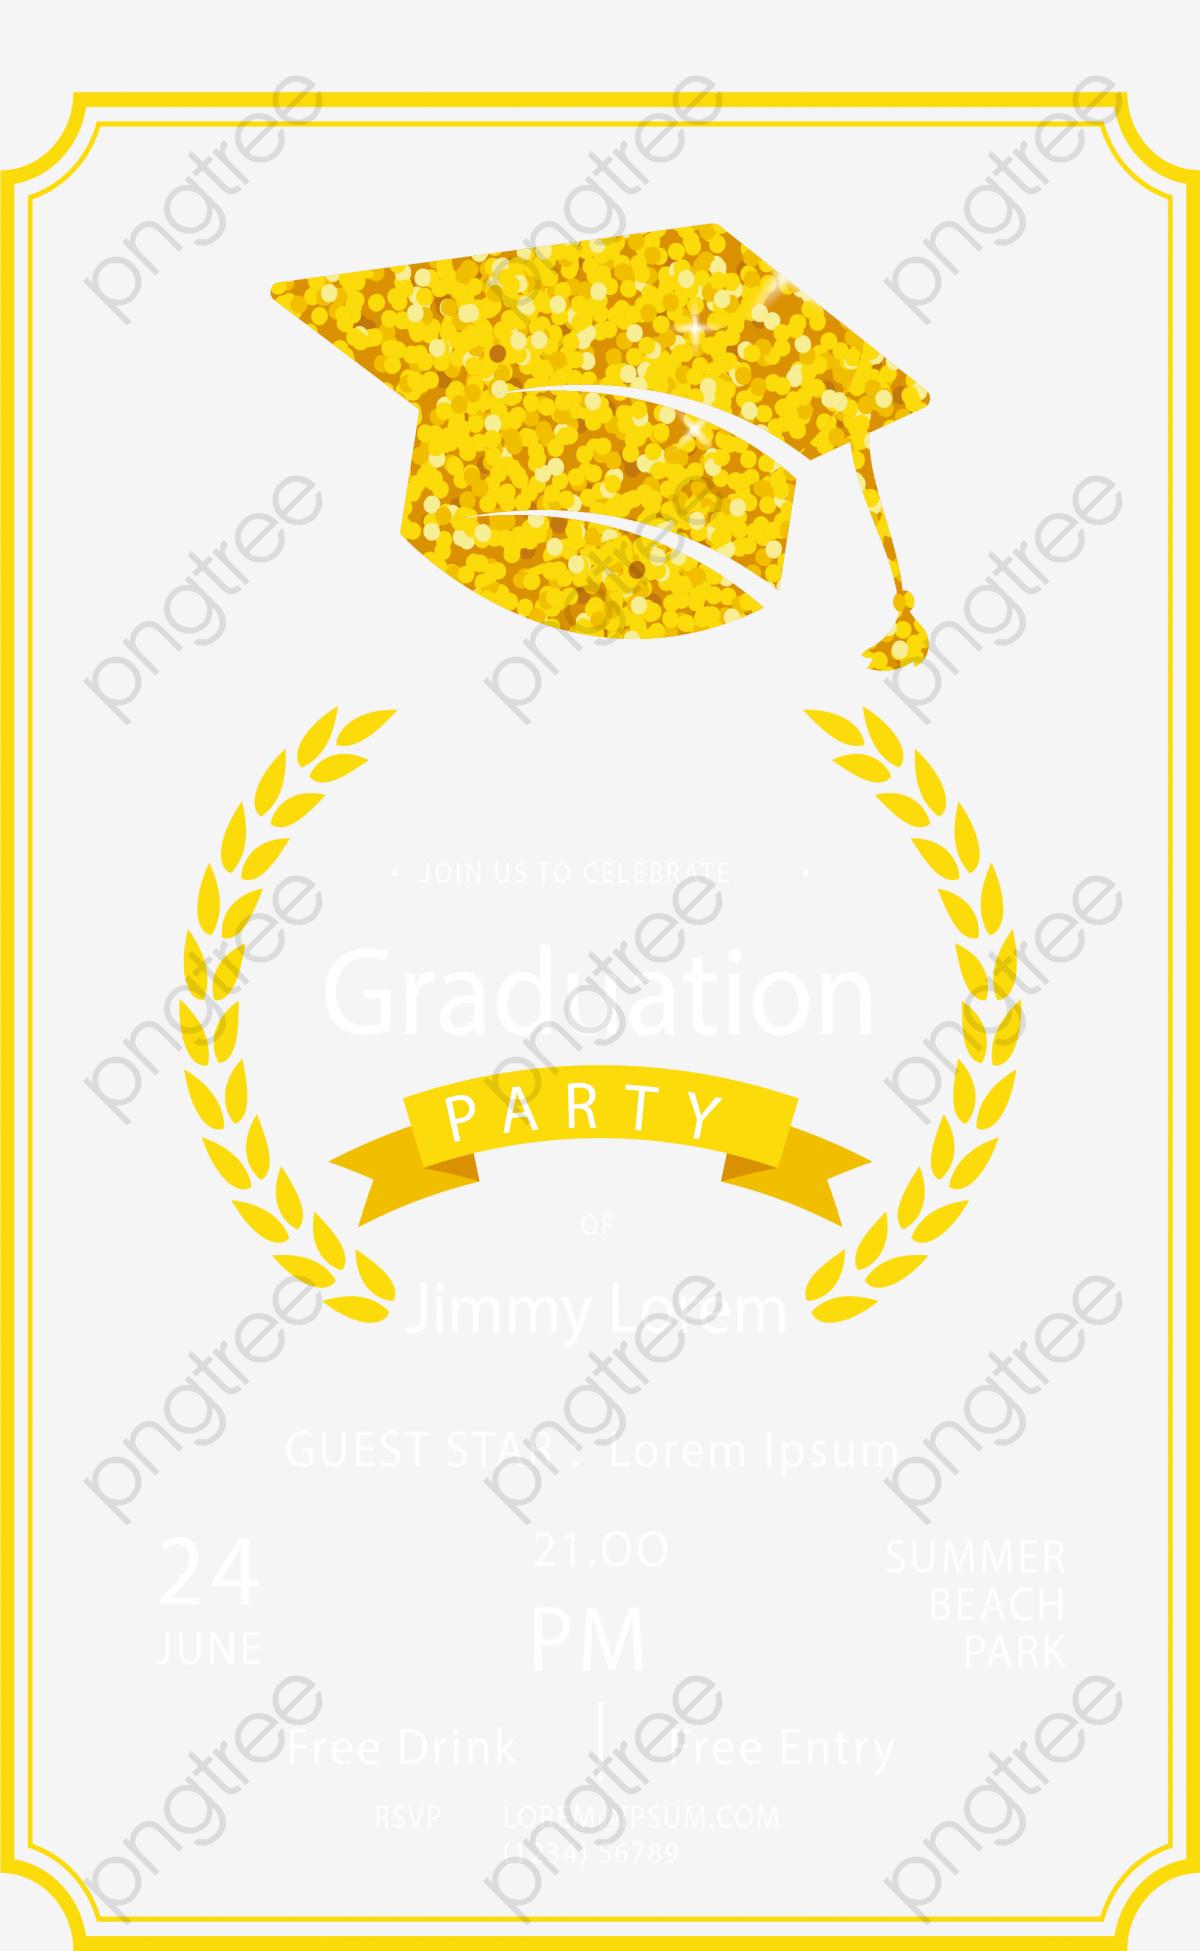 Golden Bachelor Cap Graduation Party Invitation, Vector Png, Golden.